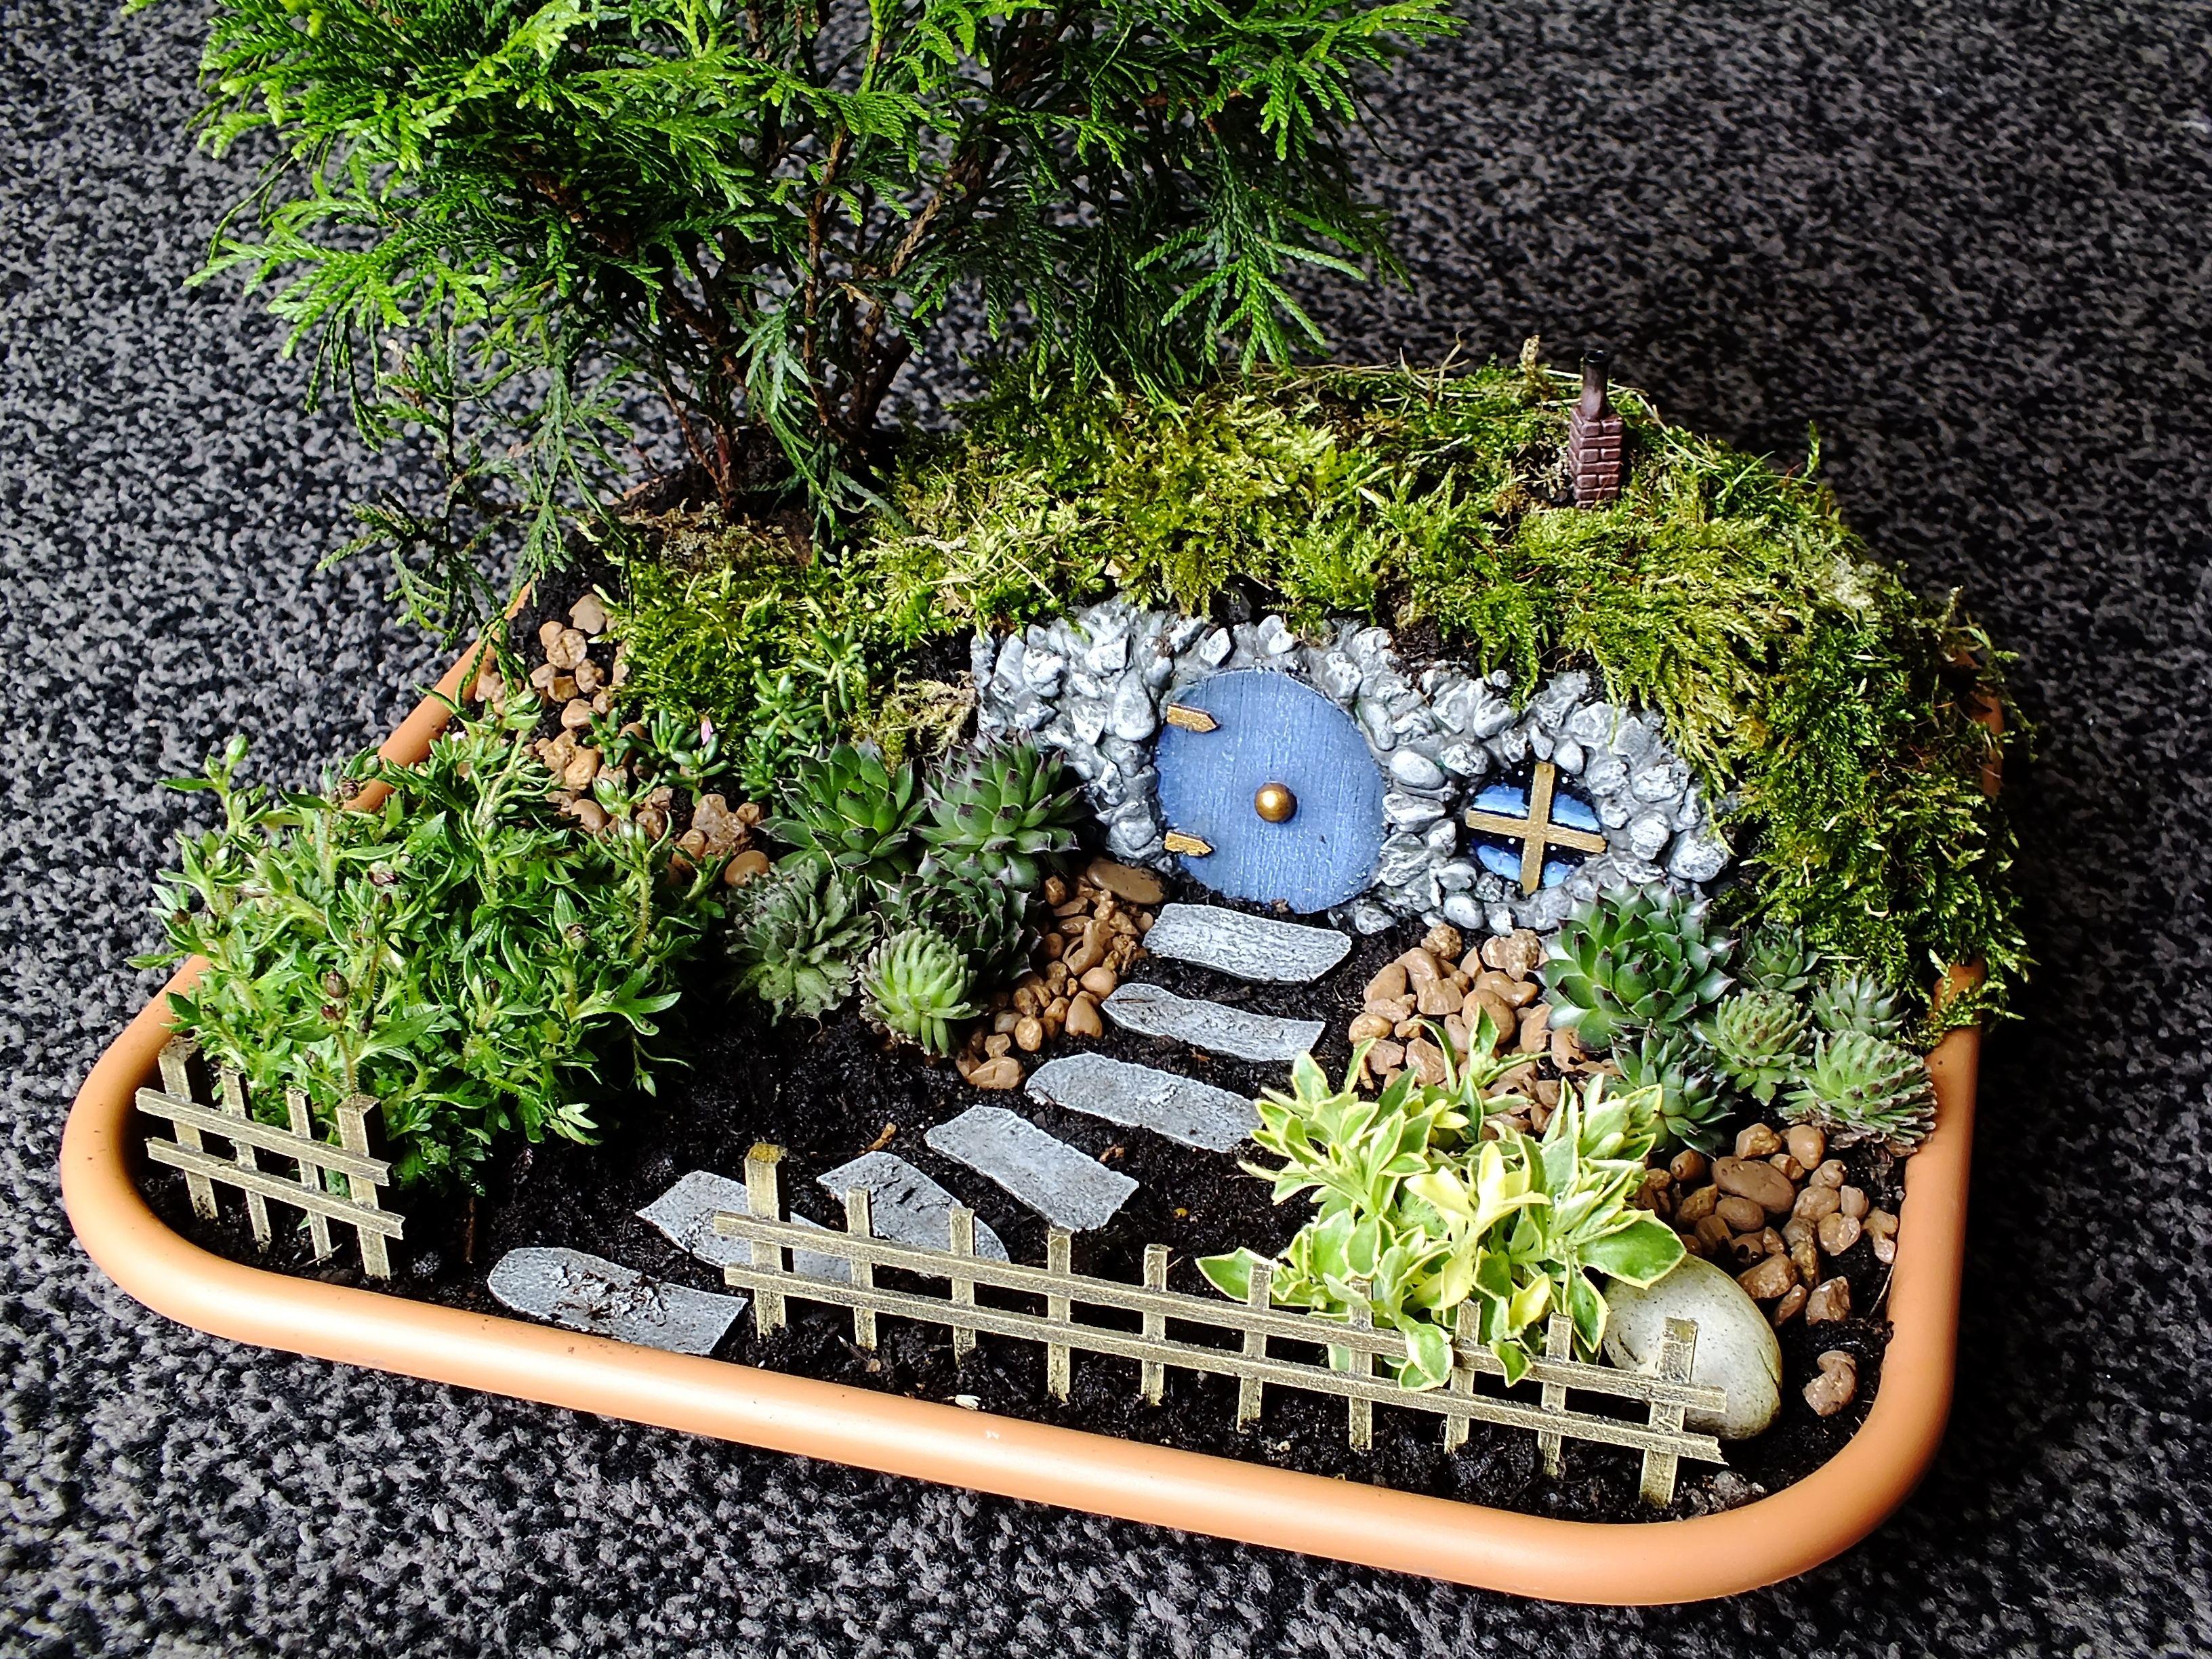 Fairy garden with a little hobbit style house #2: 82f2d6fd304eb6dfae23b5f4a